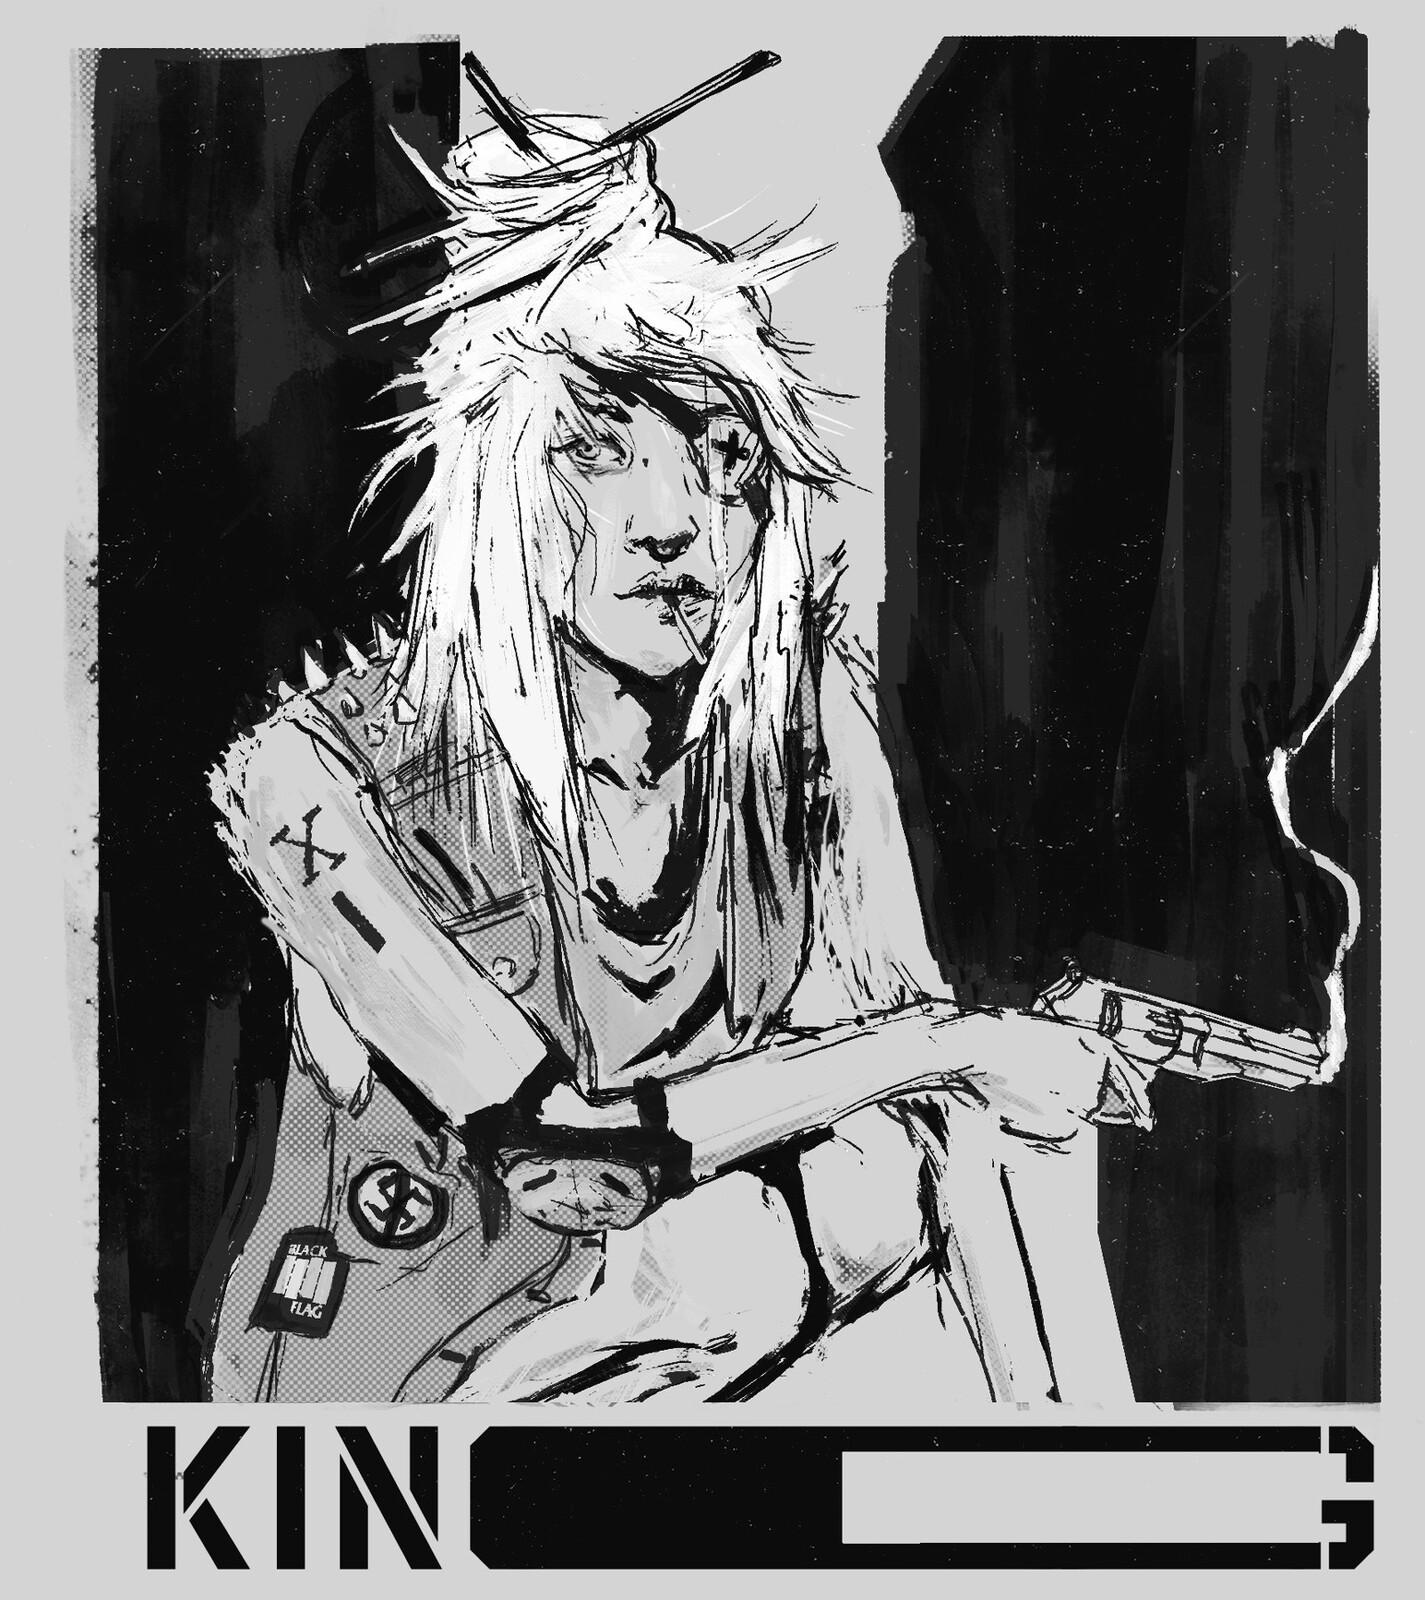 KING - Art Habit 04